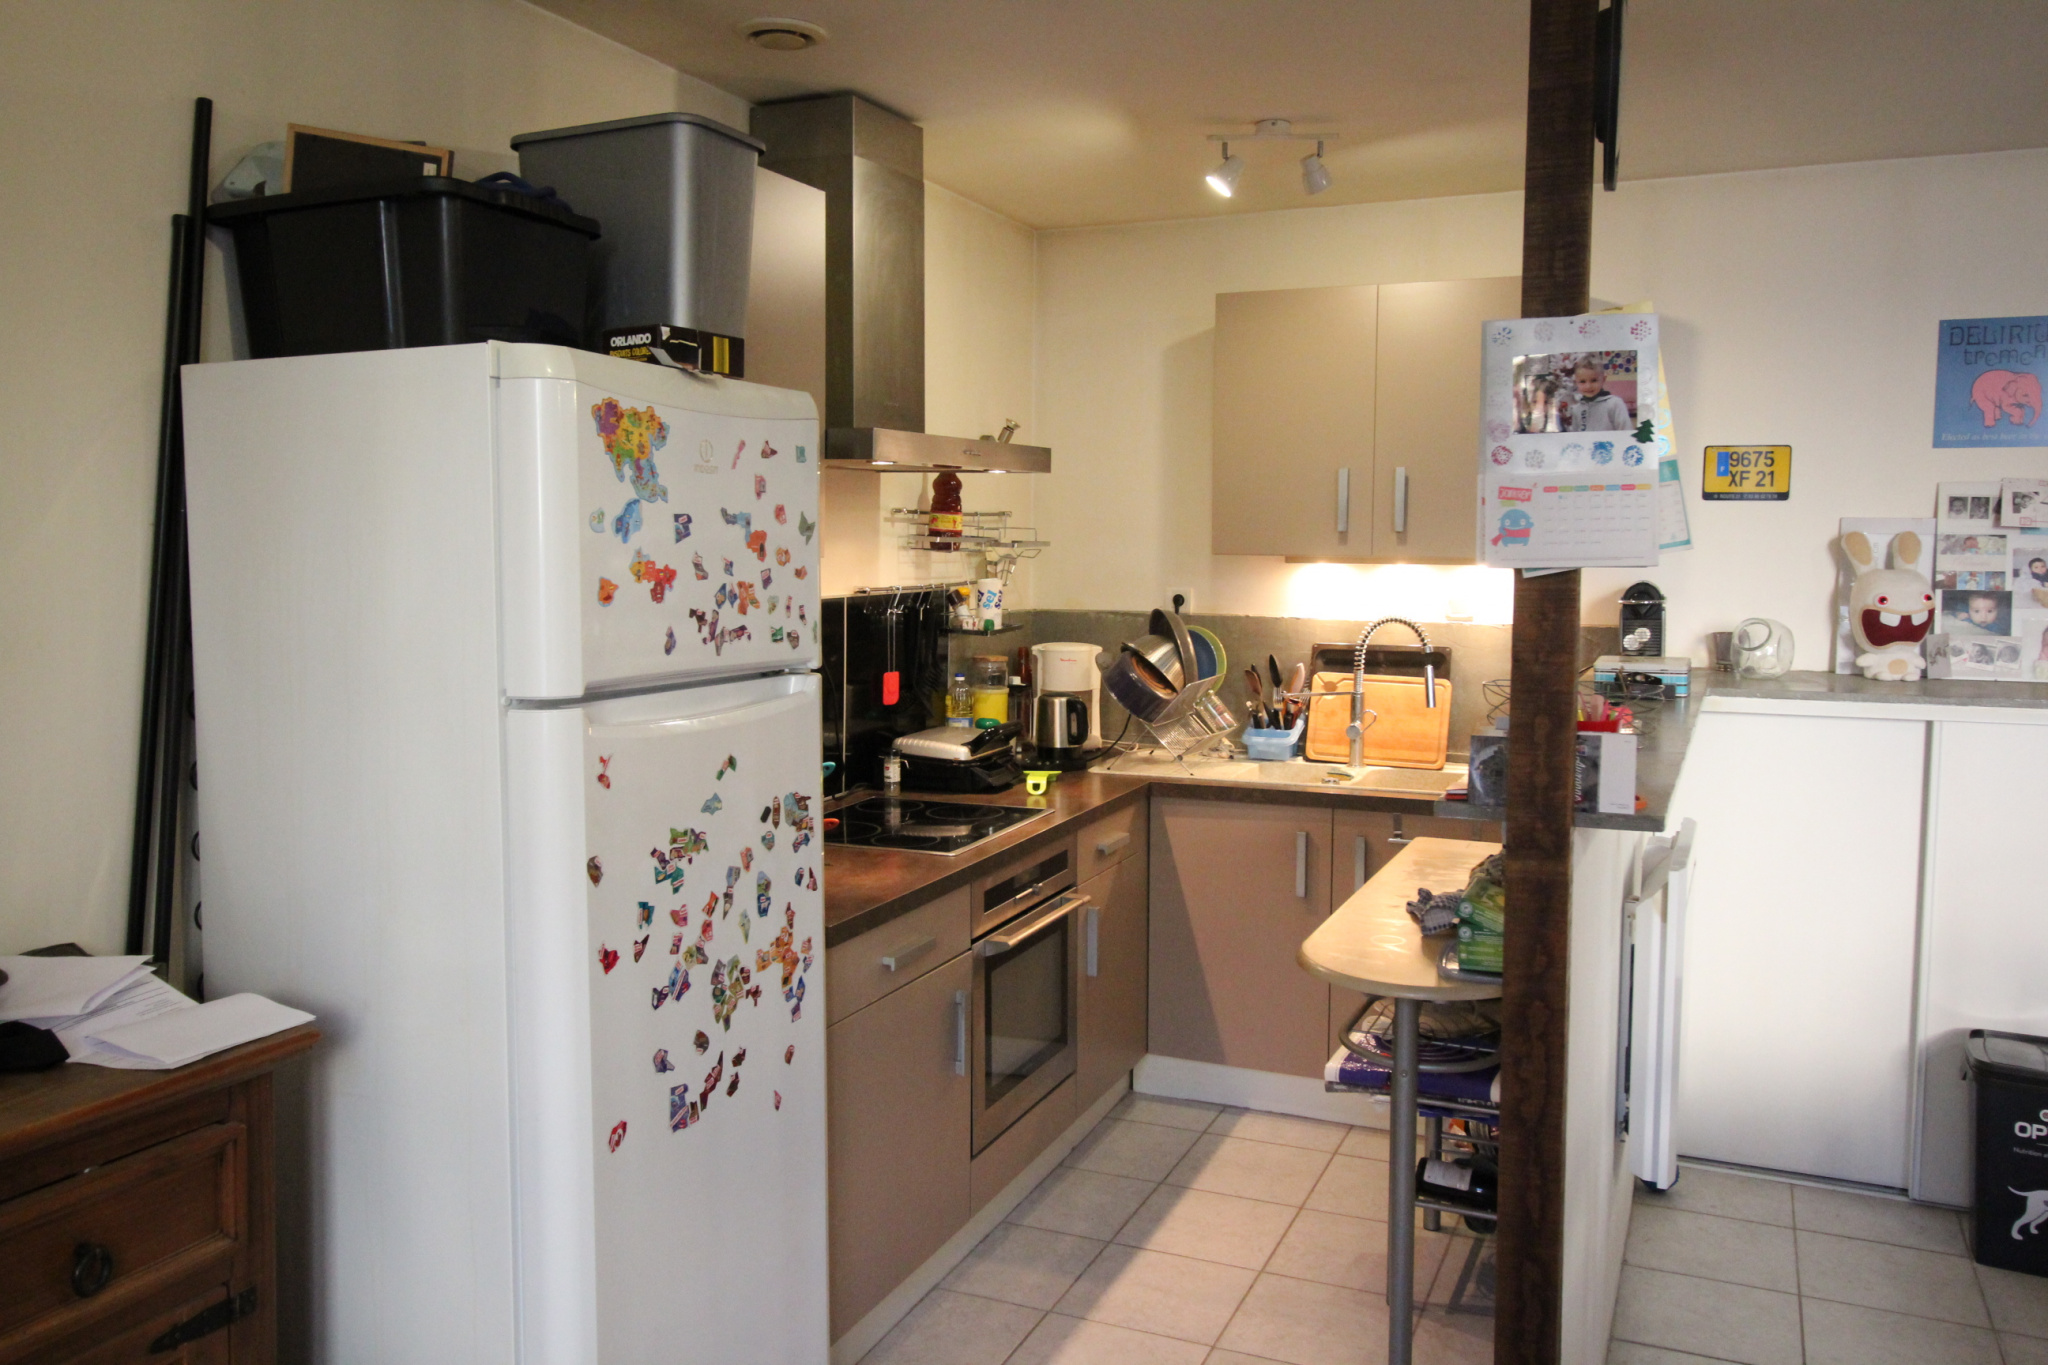 Vente appartement auxonne �coles maternelle / primaire / coll�ge / lyc�e